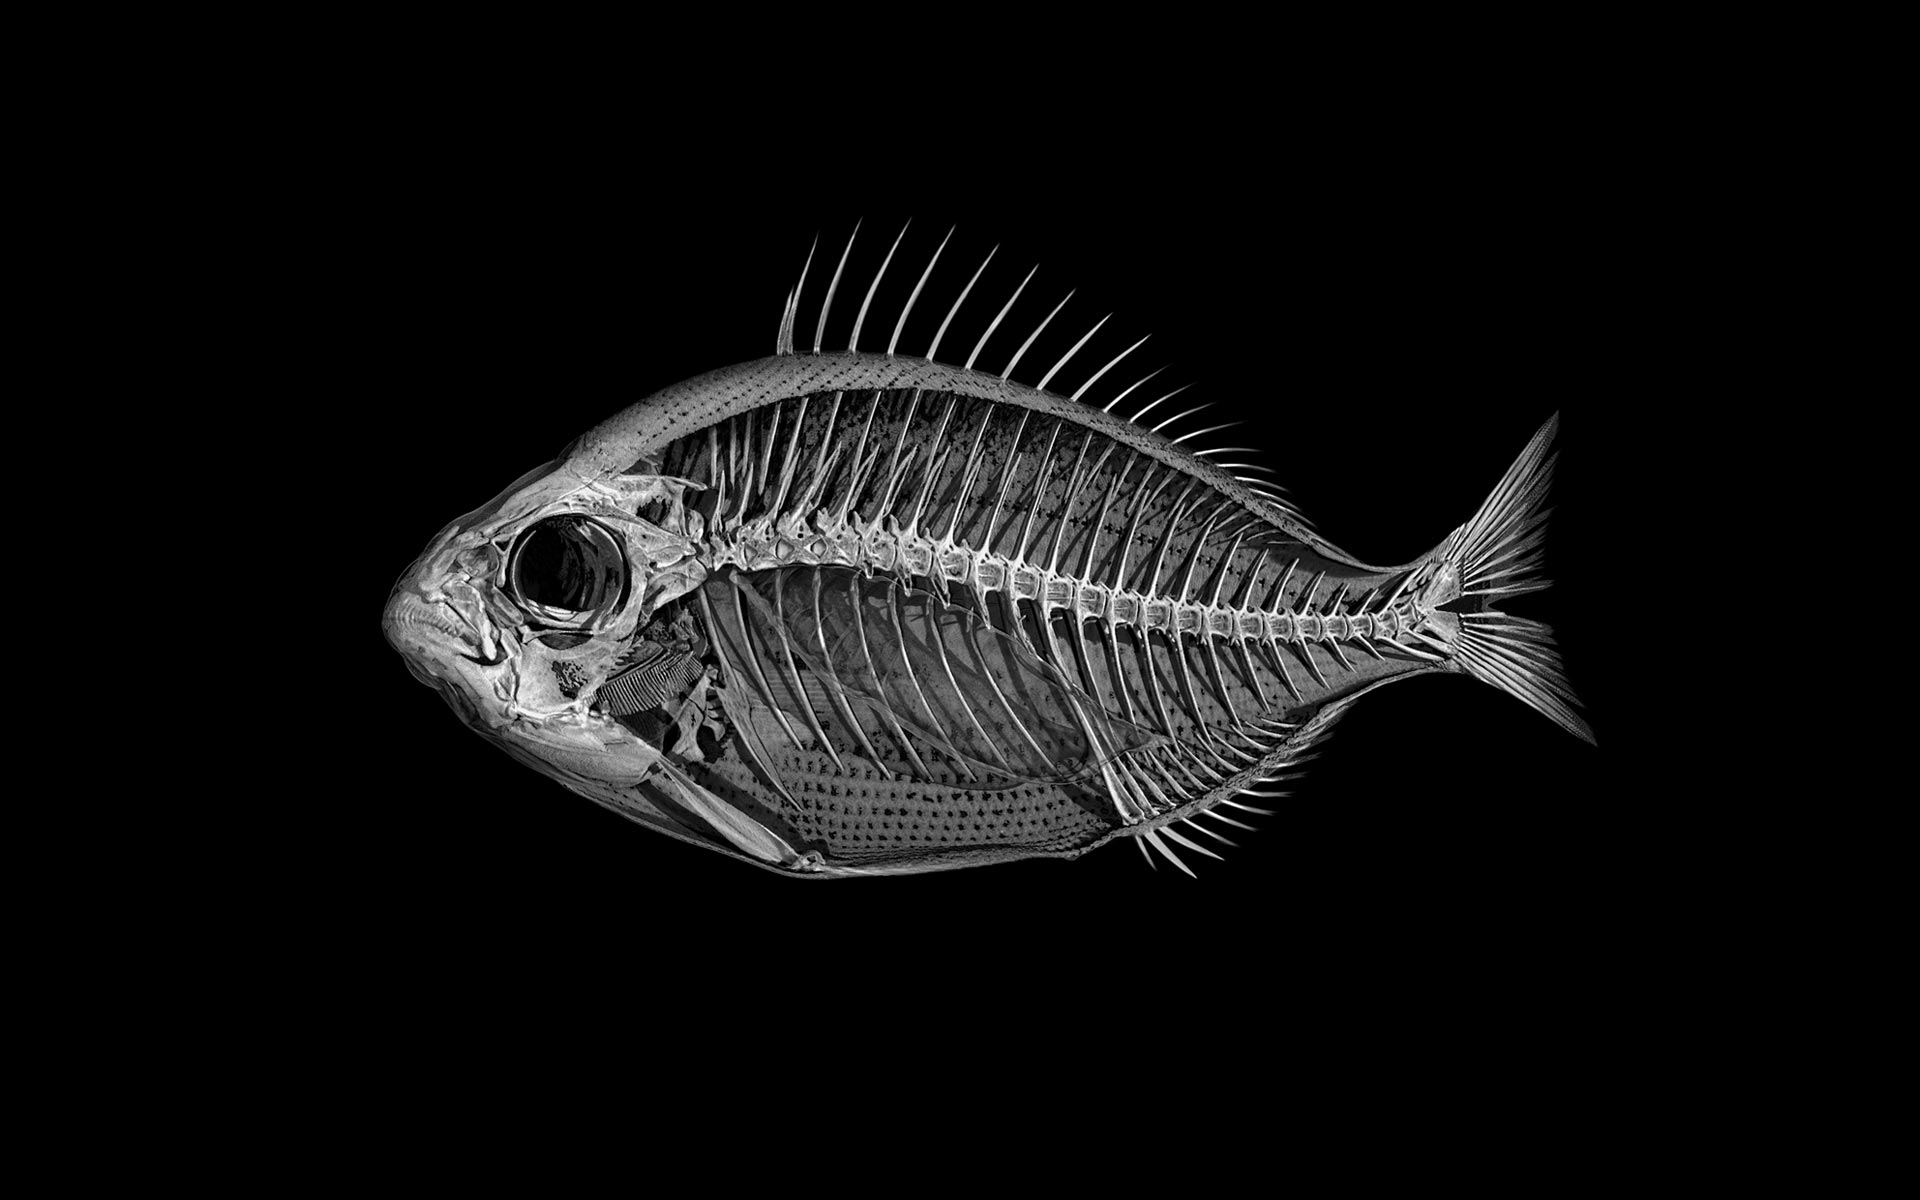 Giles Revell - Fish, Dave Dye